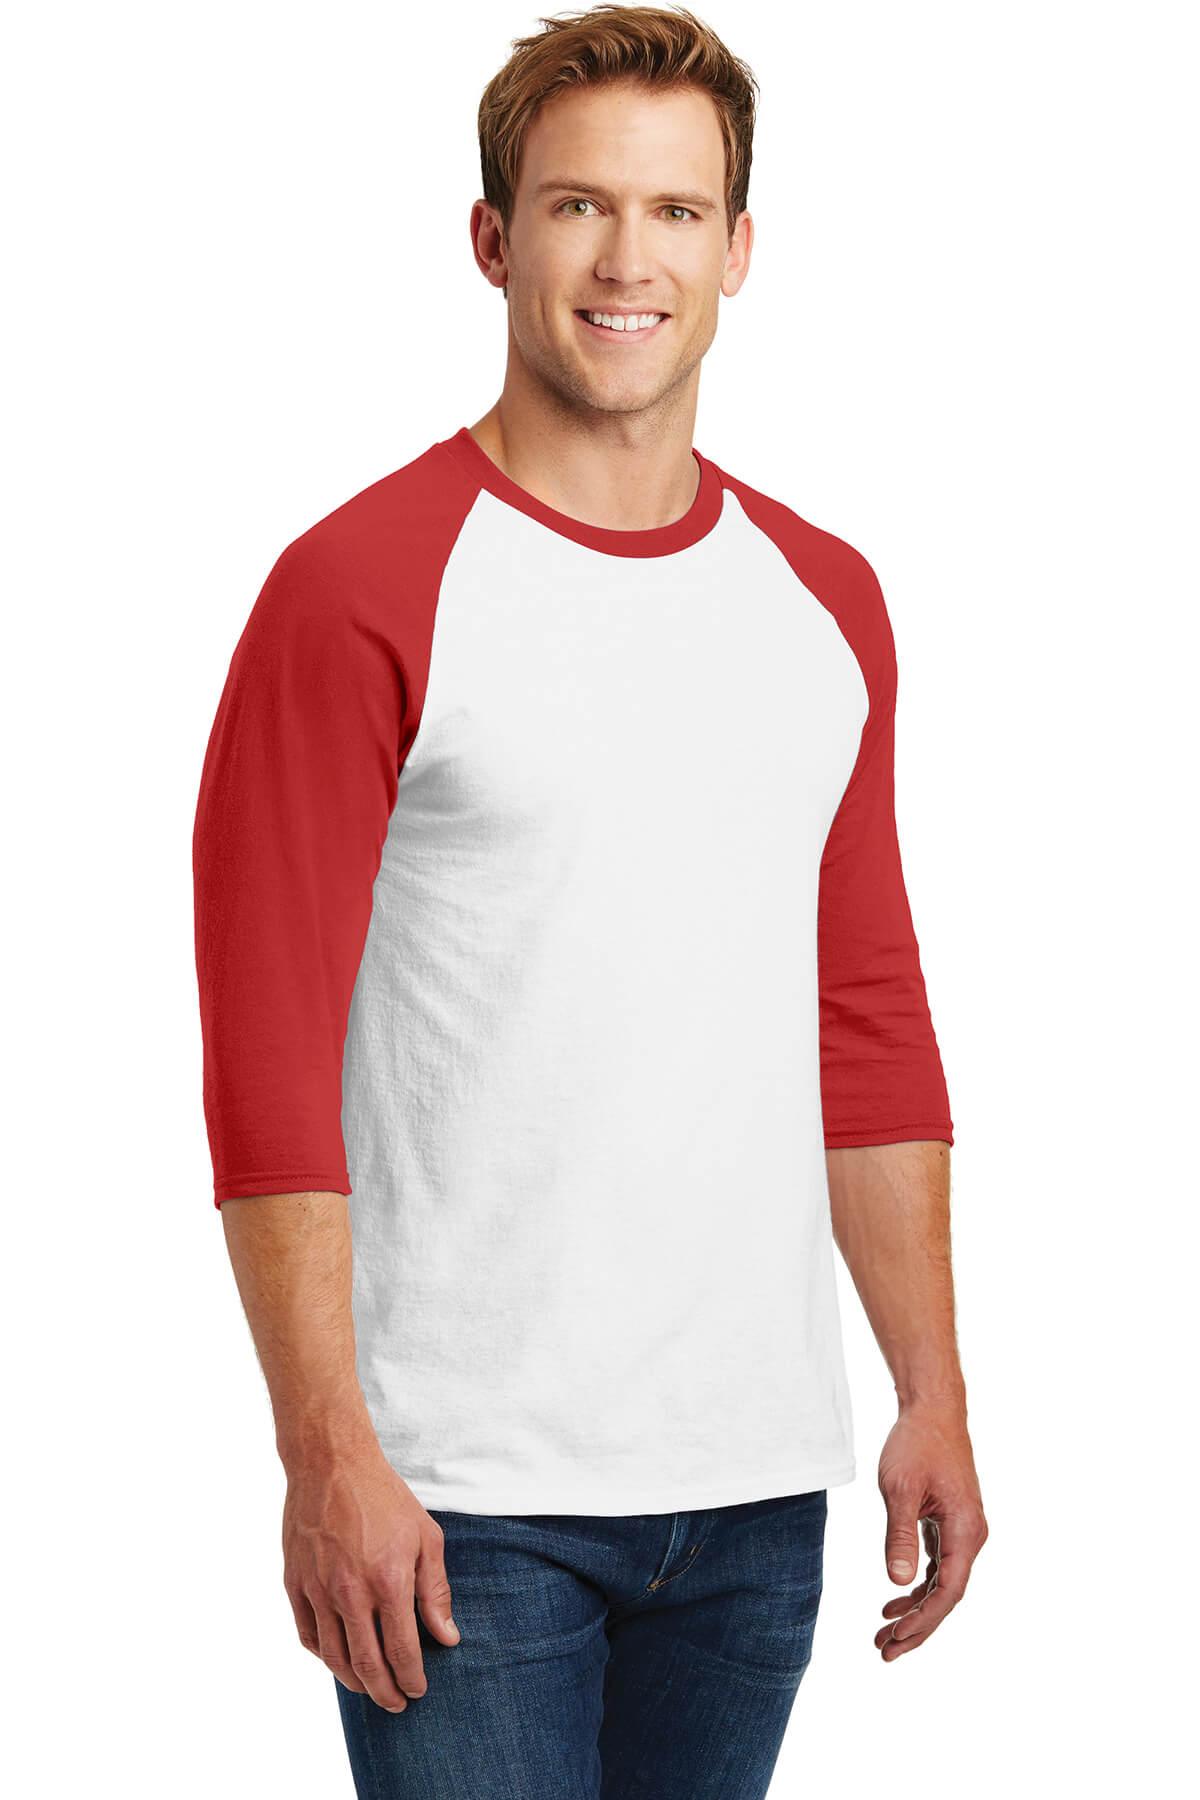 5700-white-red-4